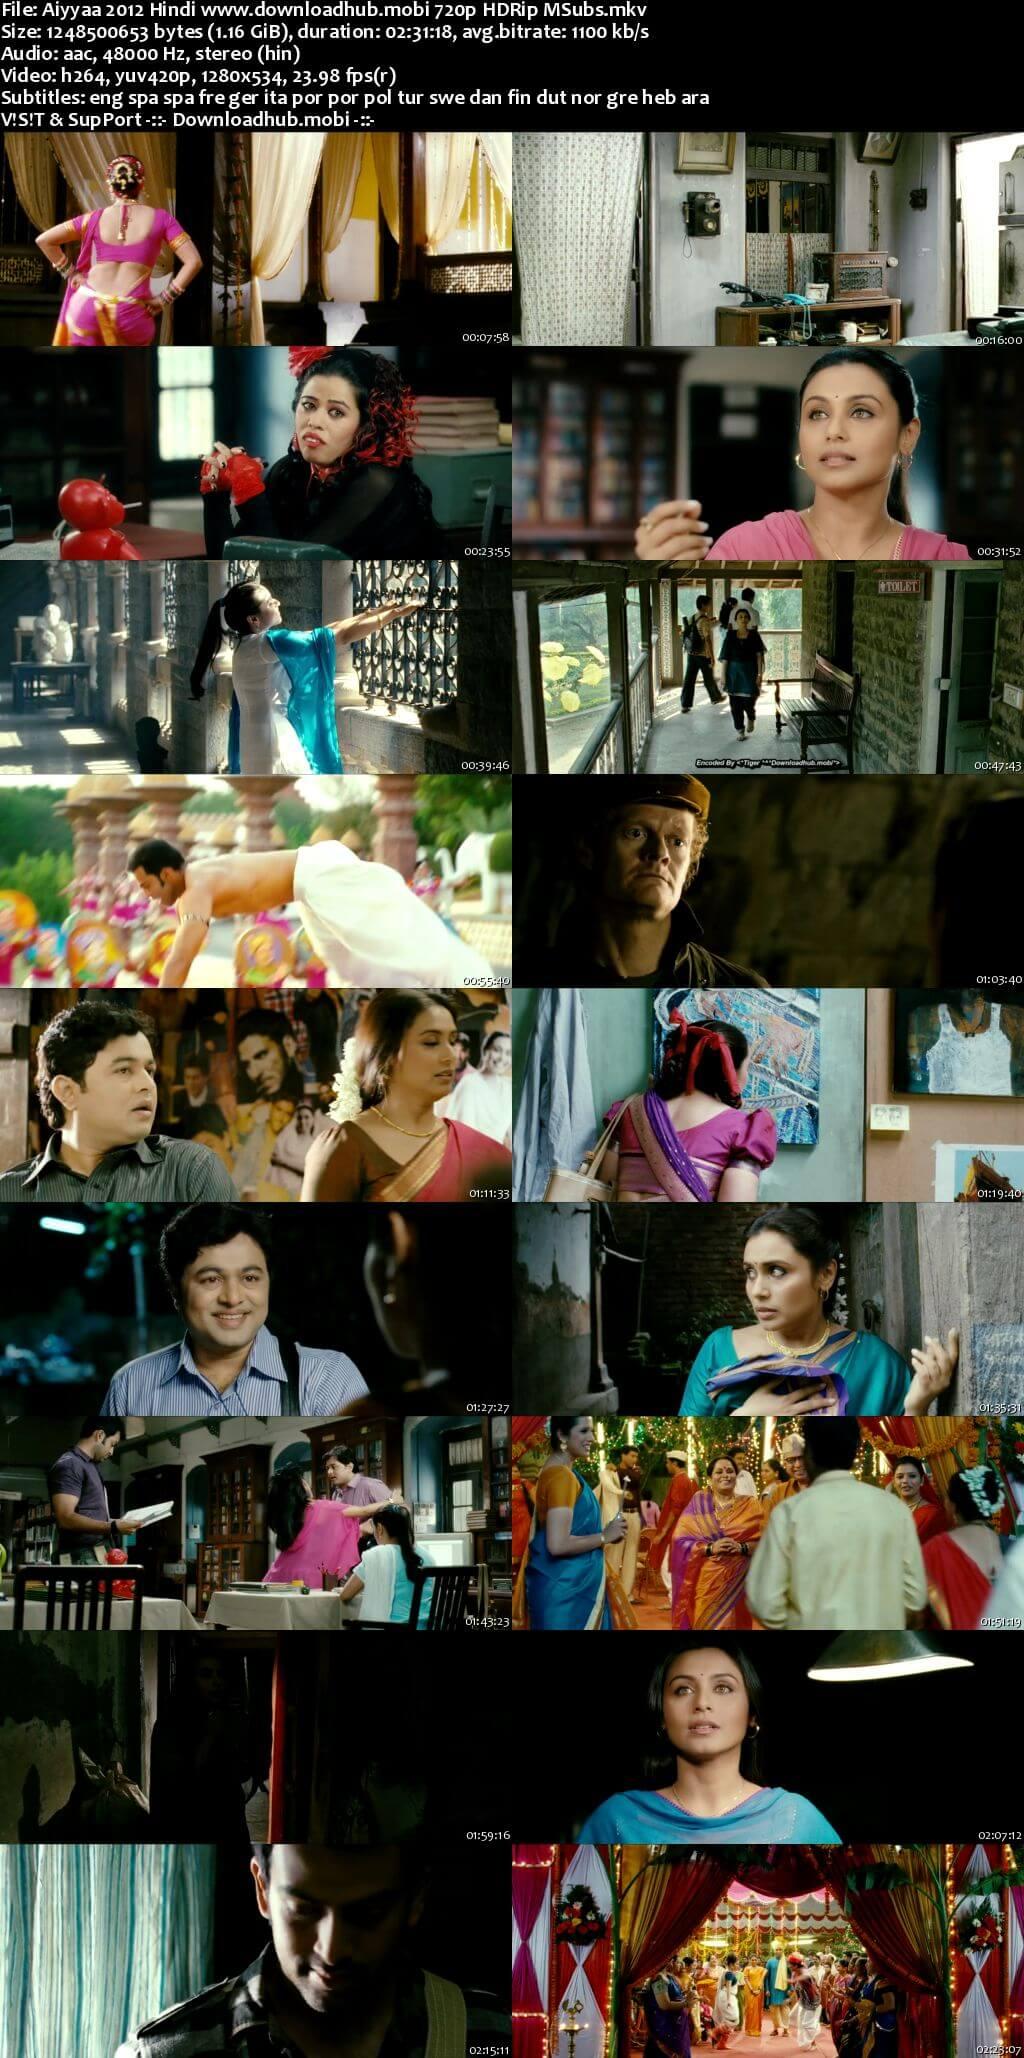 Aiyyaa 2012 Hindi 720p HDRip MSubs